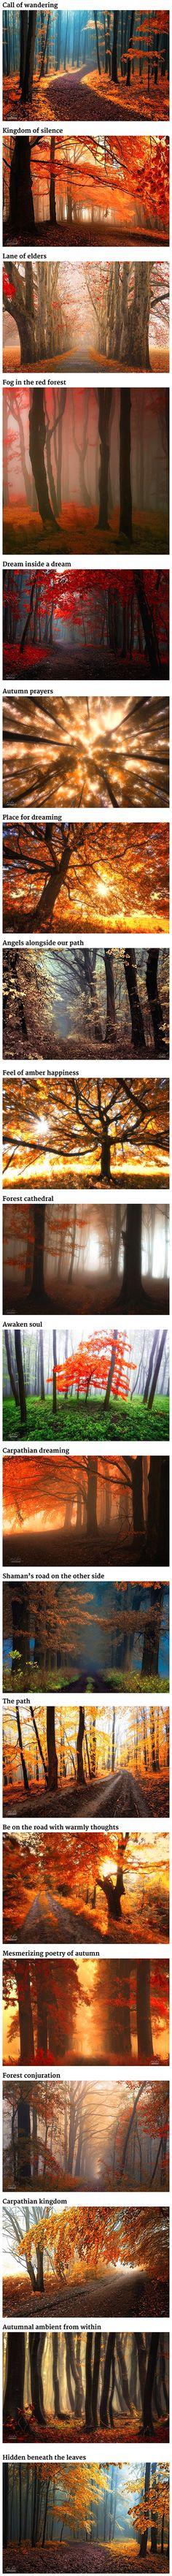 Dream-Like Autumn Forests By Czech Photographer Janek Sedlář.